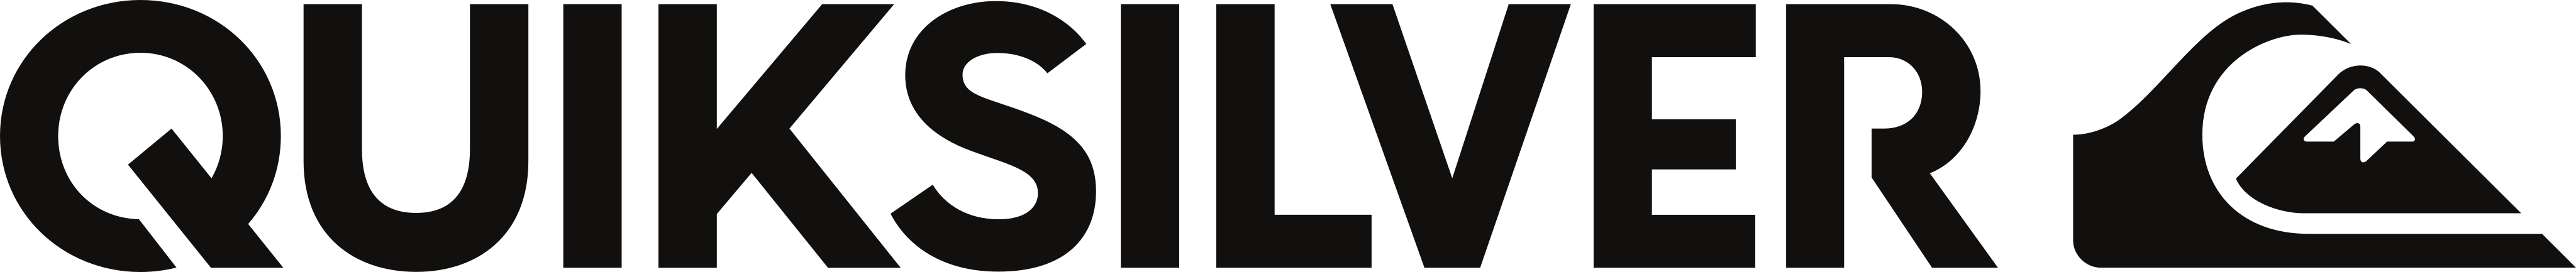 quiksilver logo - Quiksilver Logo